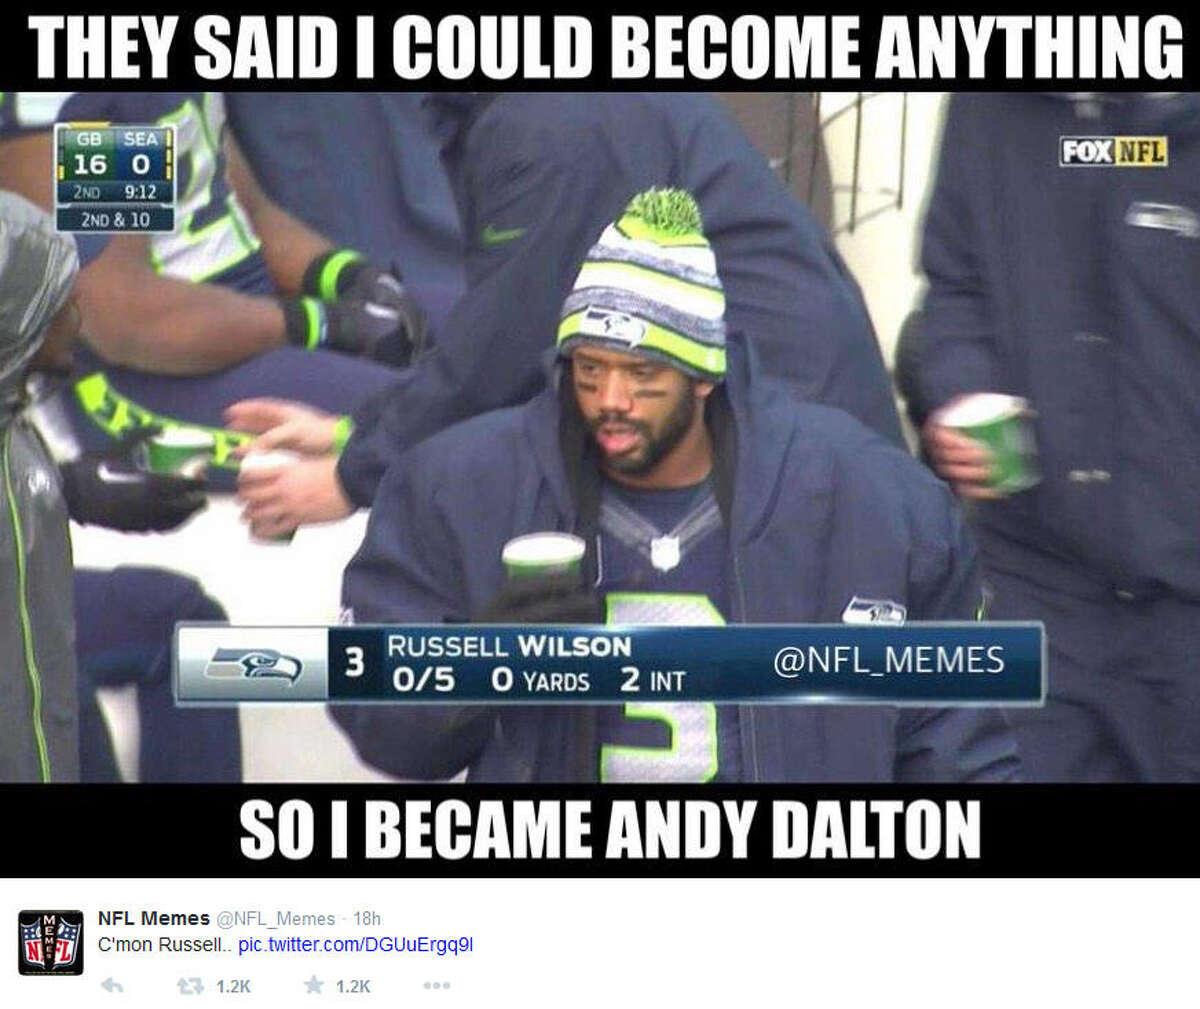 January 18, 2015 Green Bay Packers @ Seattle Seahawks, Score: 22-28 Photo by @NFL_Memes